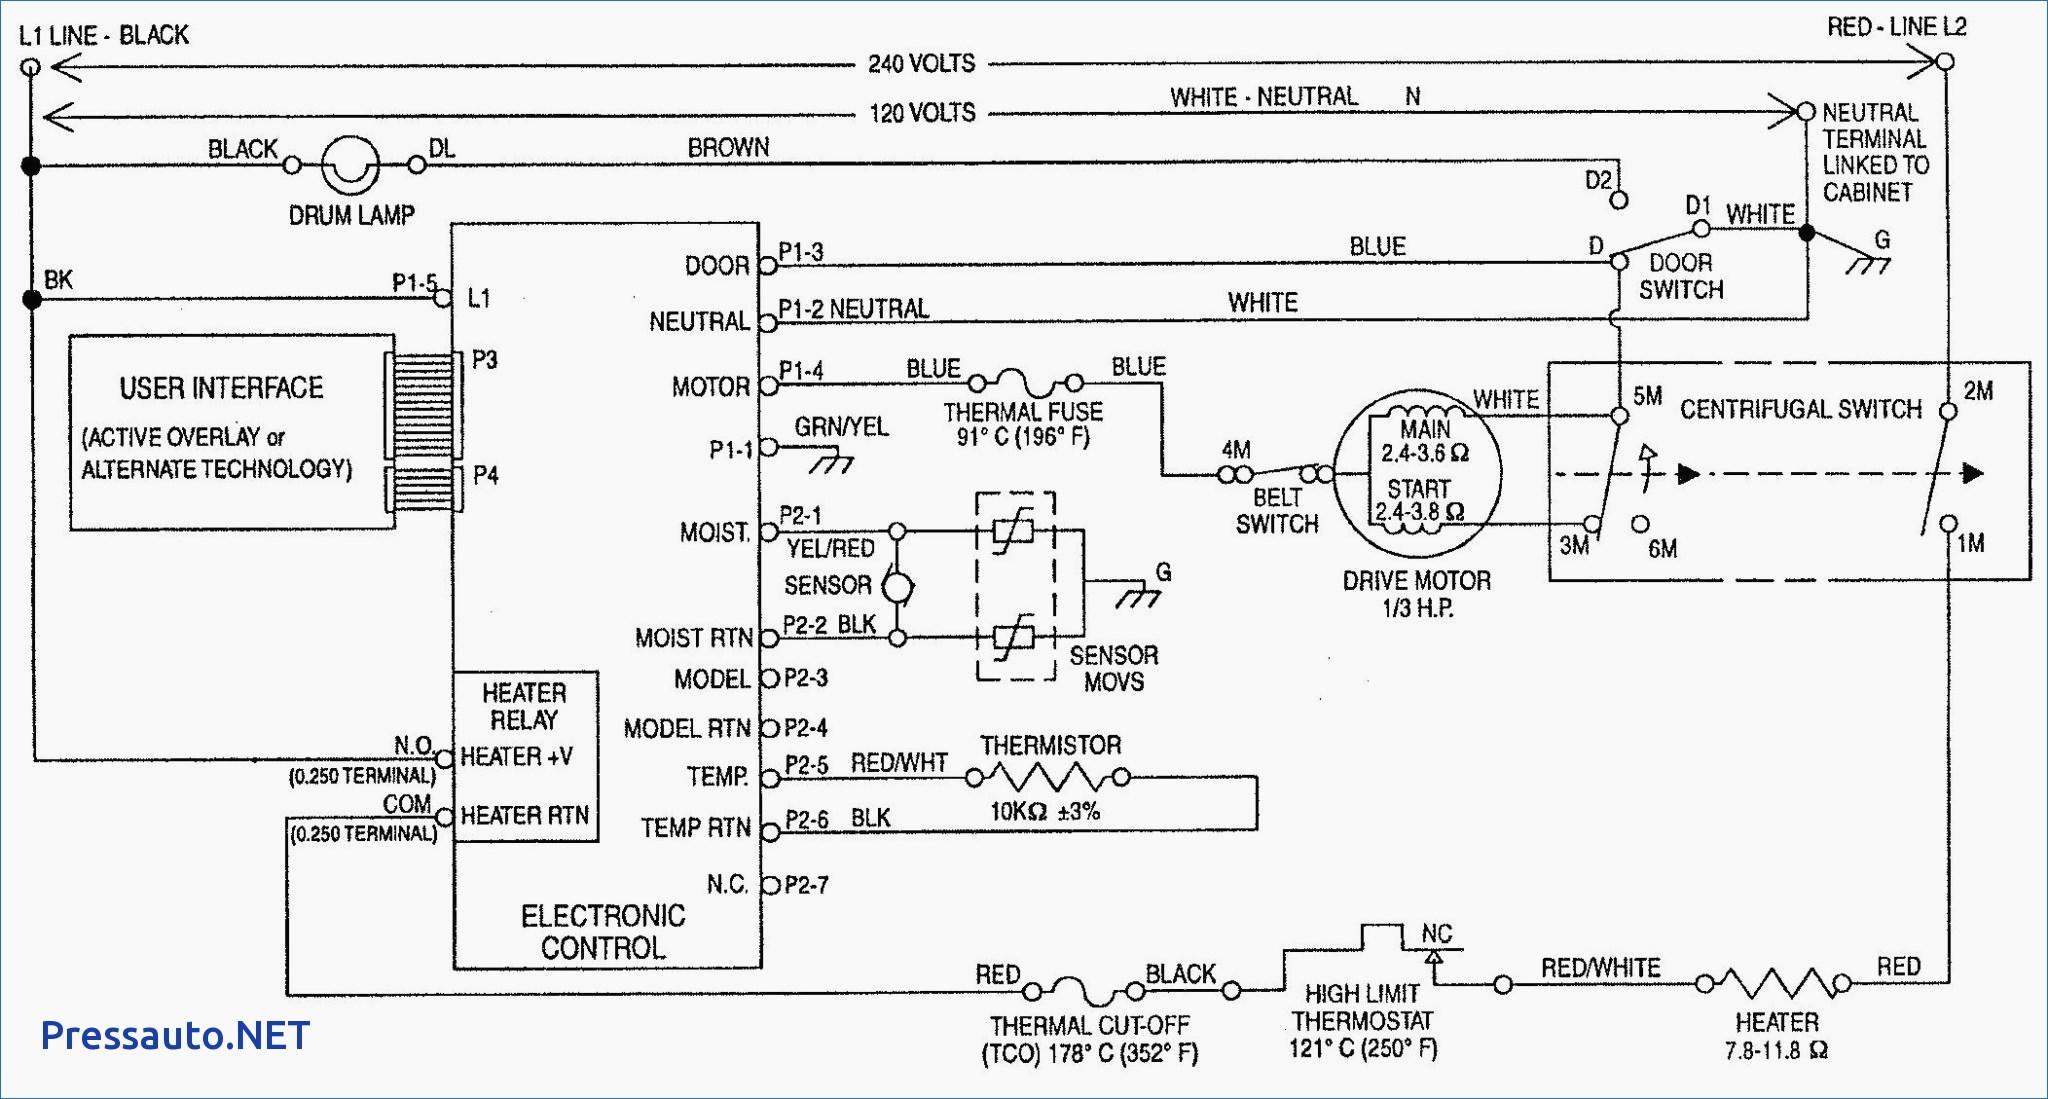 Wiring Diagram Headlights - Deltagenerali - Electric Furnace Wiring Diagram